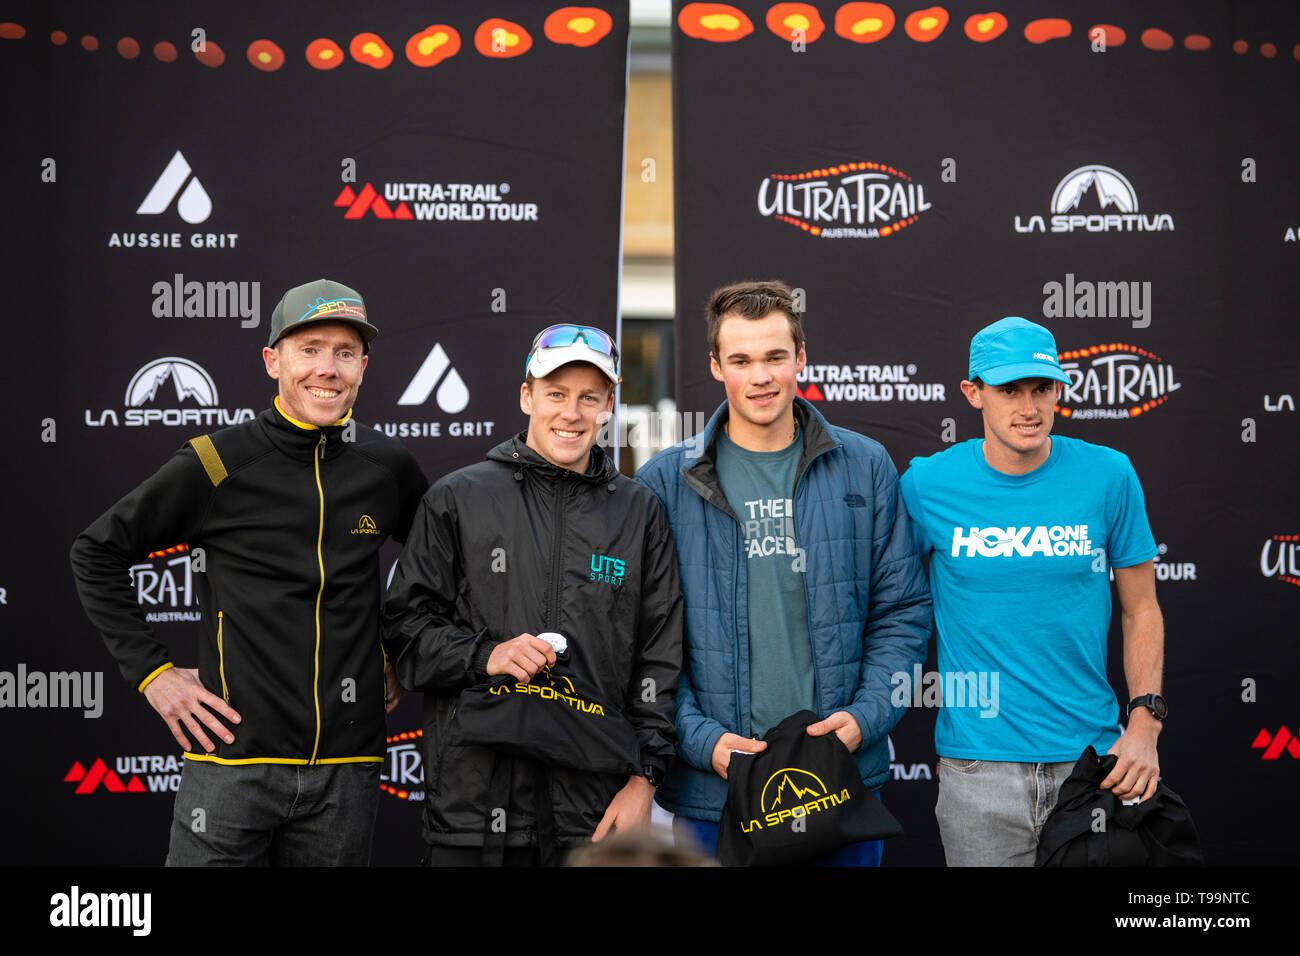 Blue Mountains, Australia - April 16 2019: Ultra-Trail Australia UTA11 race. Under 30's men race place holders on the podium - Stock Image